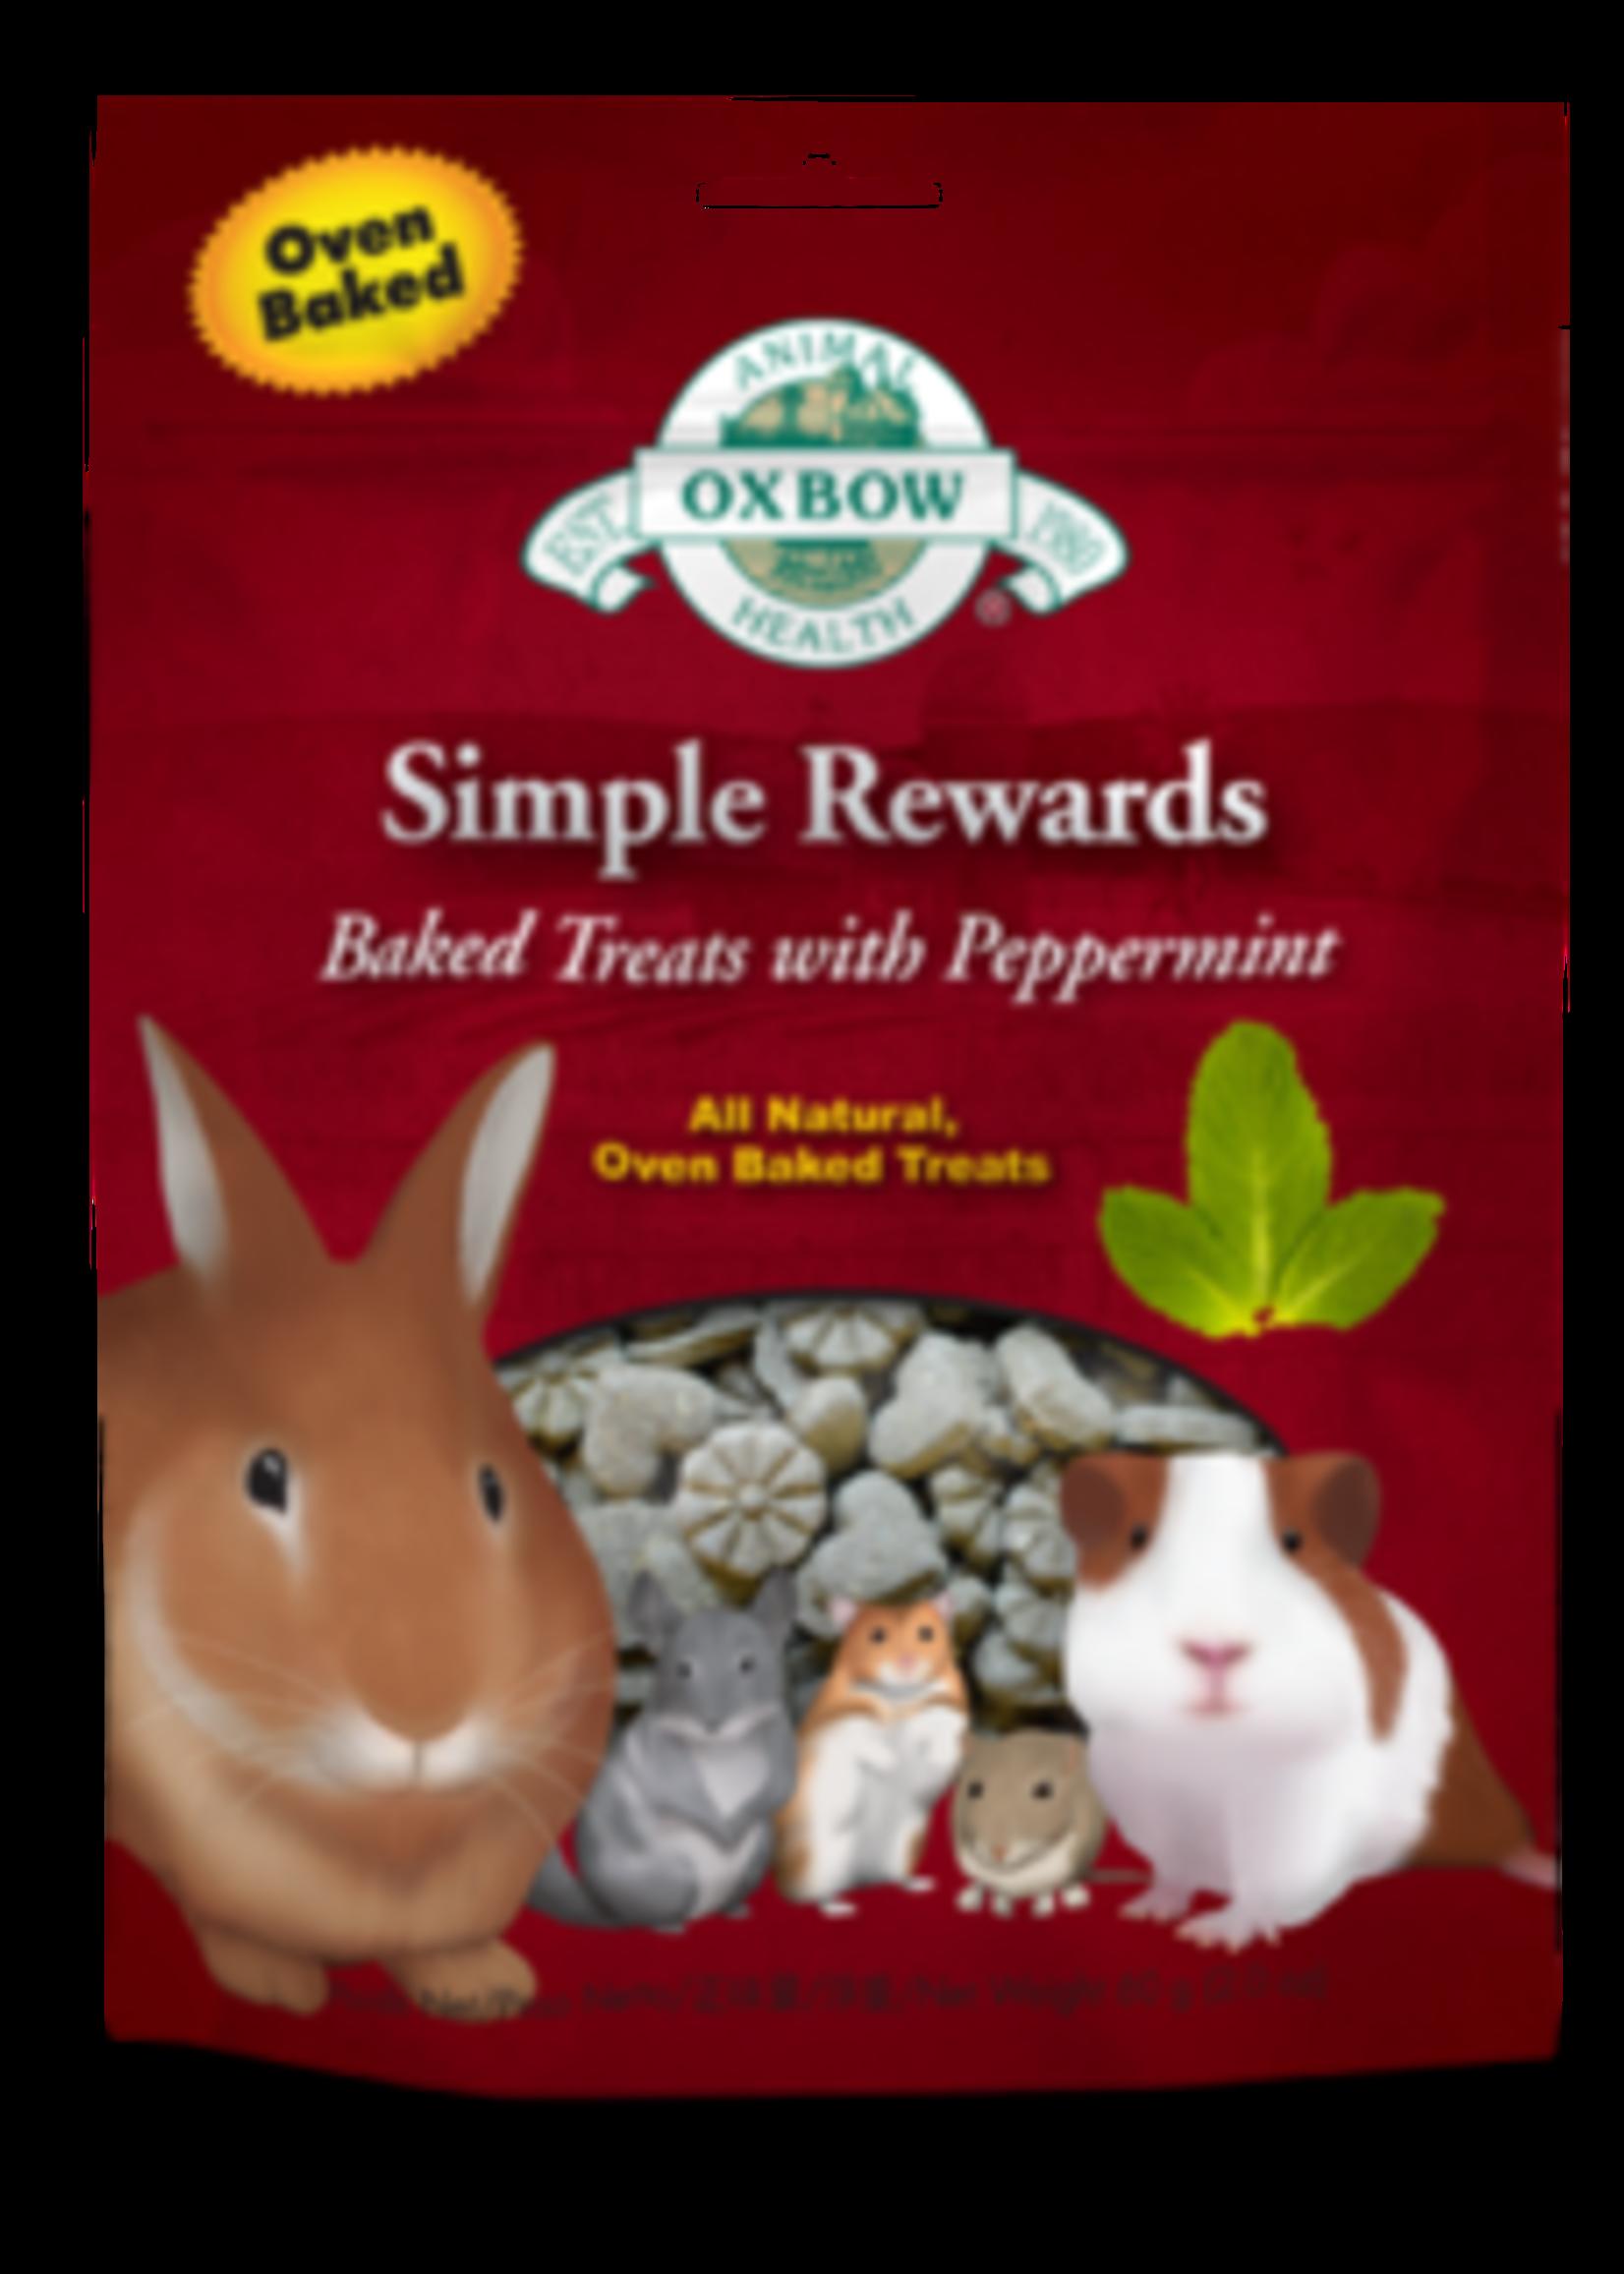 Oxbow Animal Health™ SIMPLE REWARDS BAKED TREATS w/PEPPERMINT 2oz